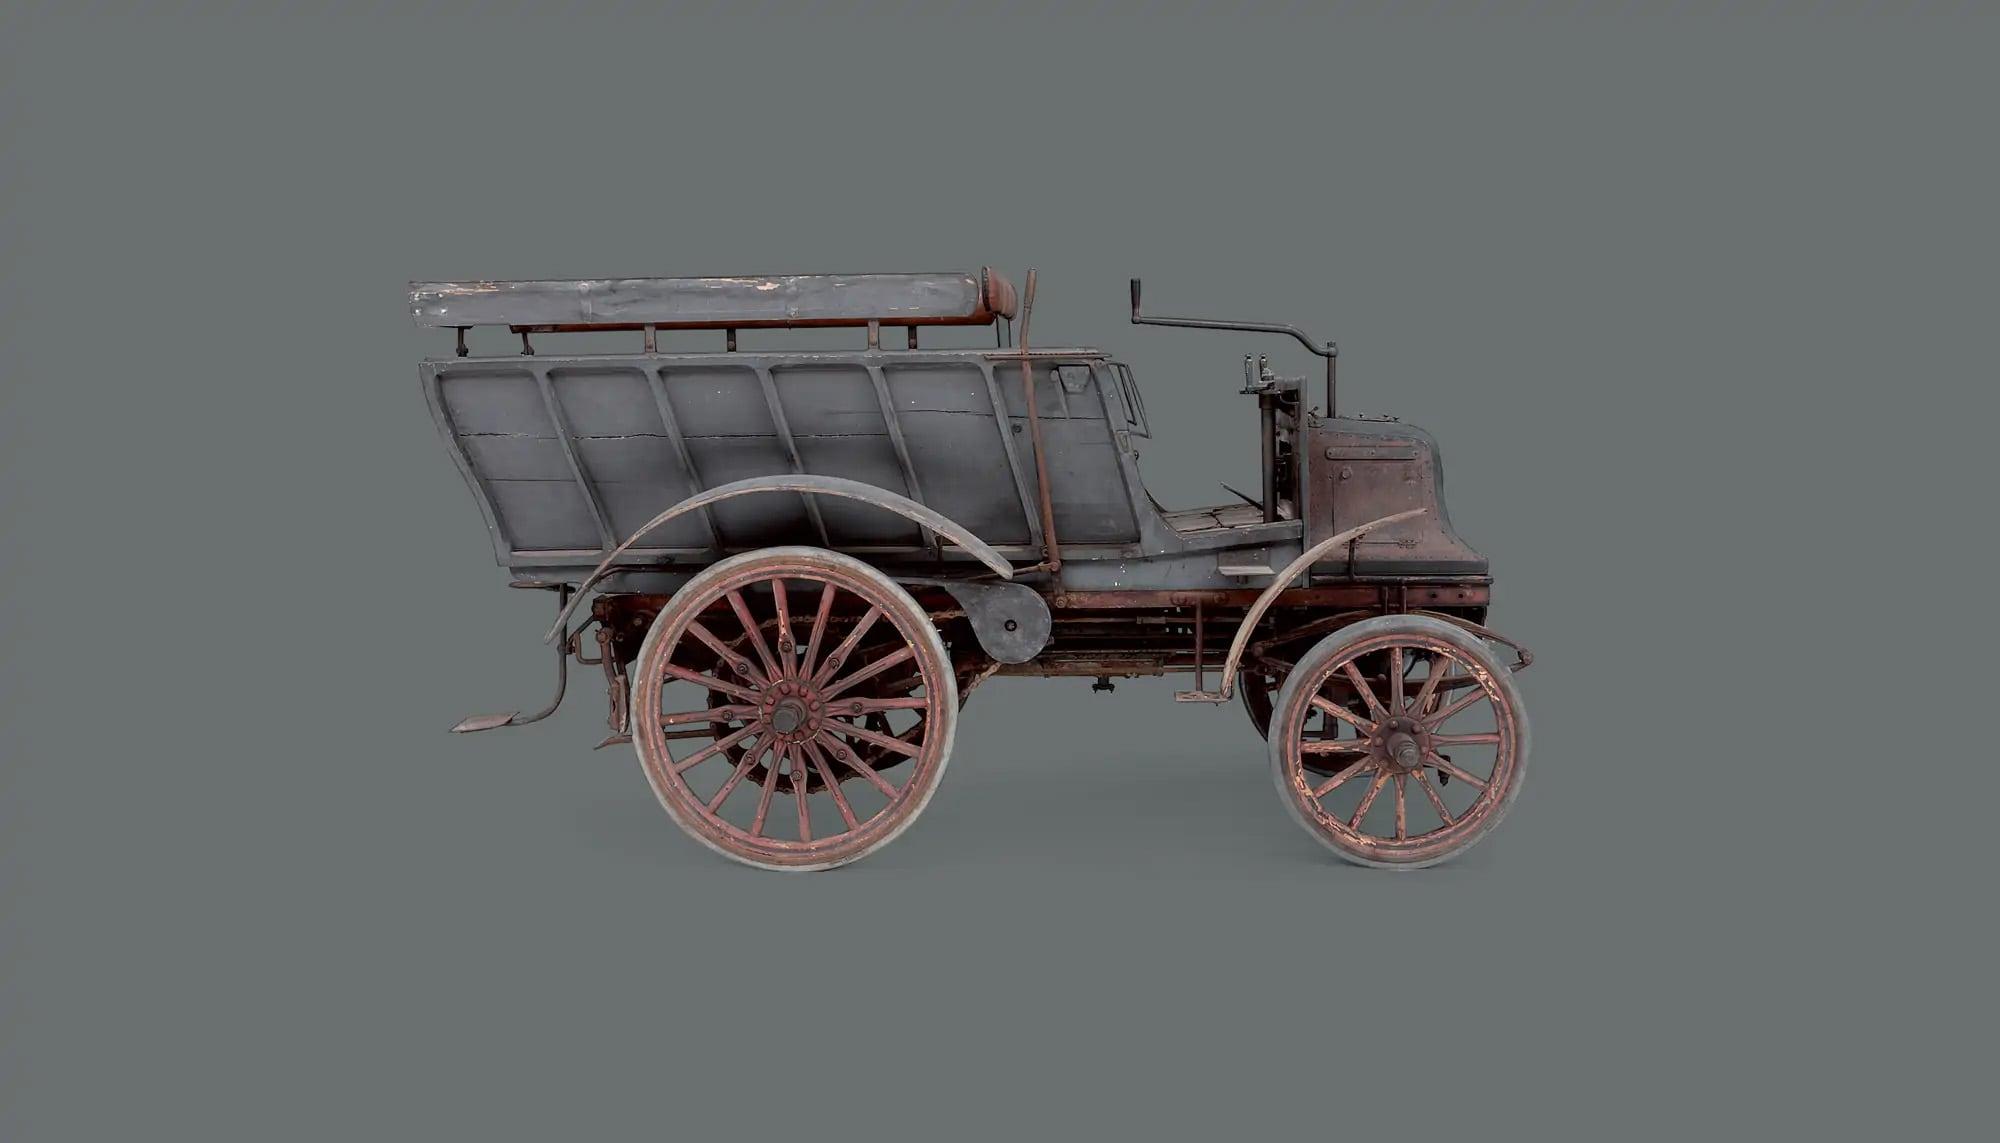 Bekijk Daimler 6-HP Twin Cylinder Six-Seat Brake in het Louwman Museum